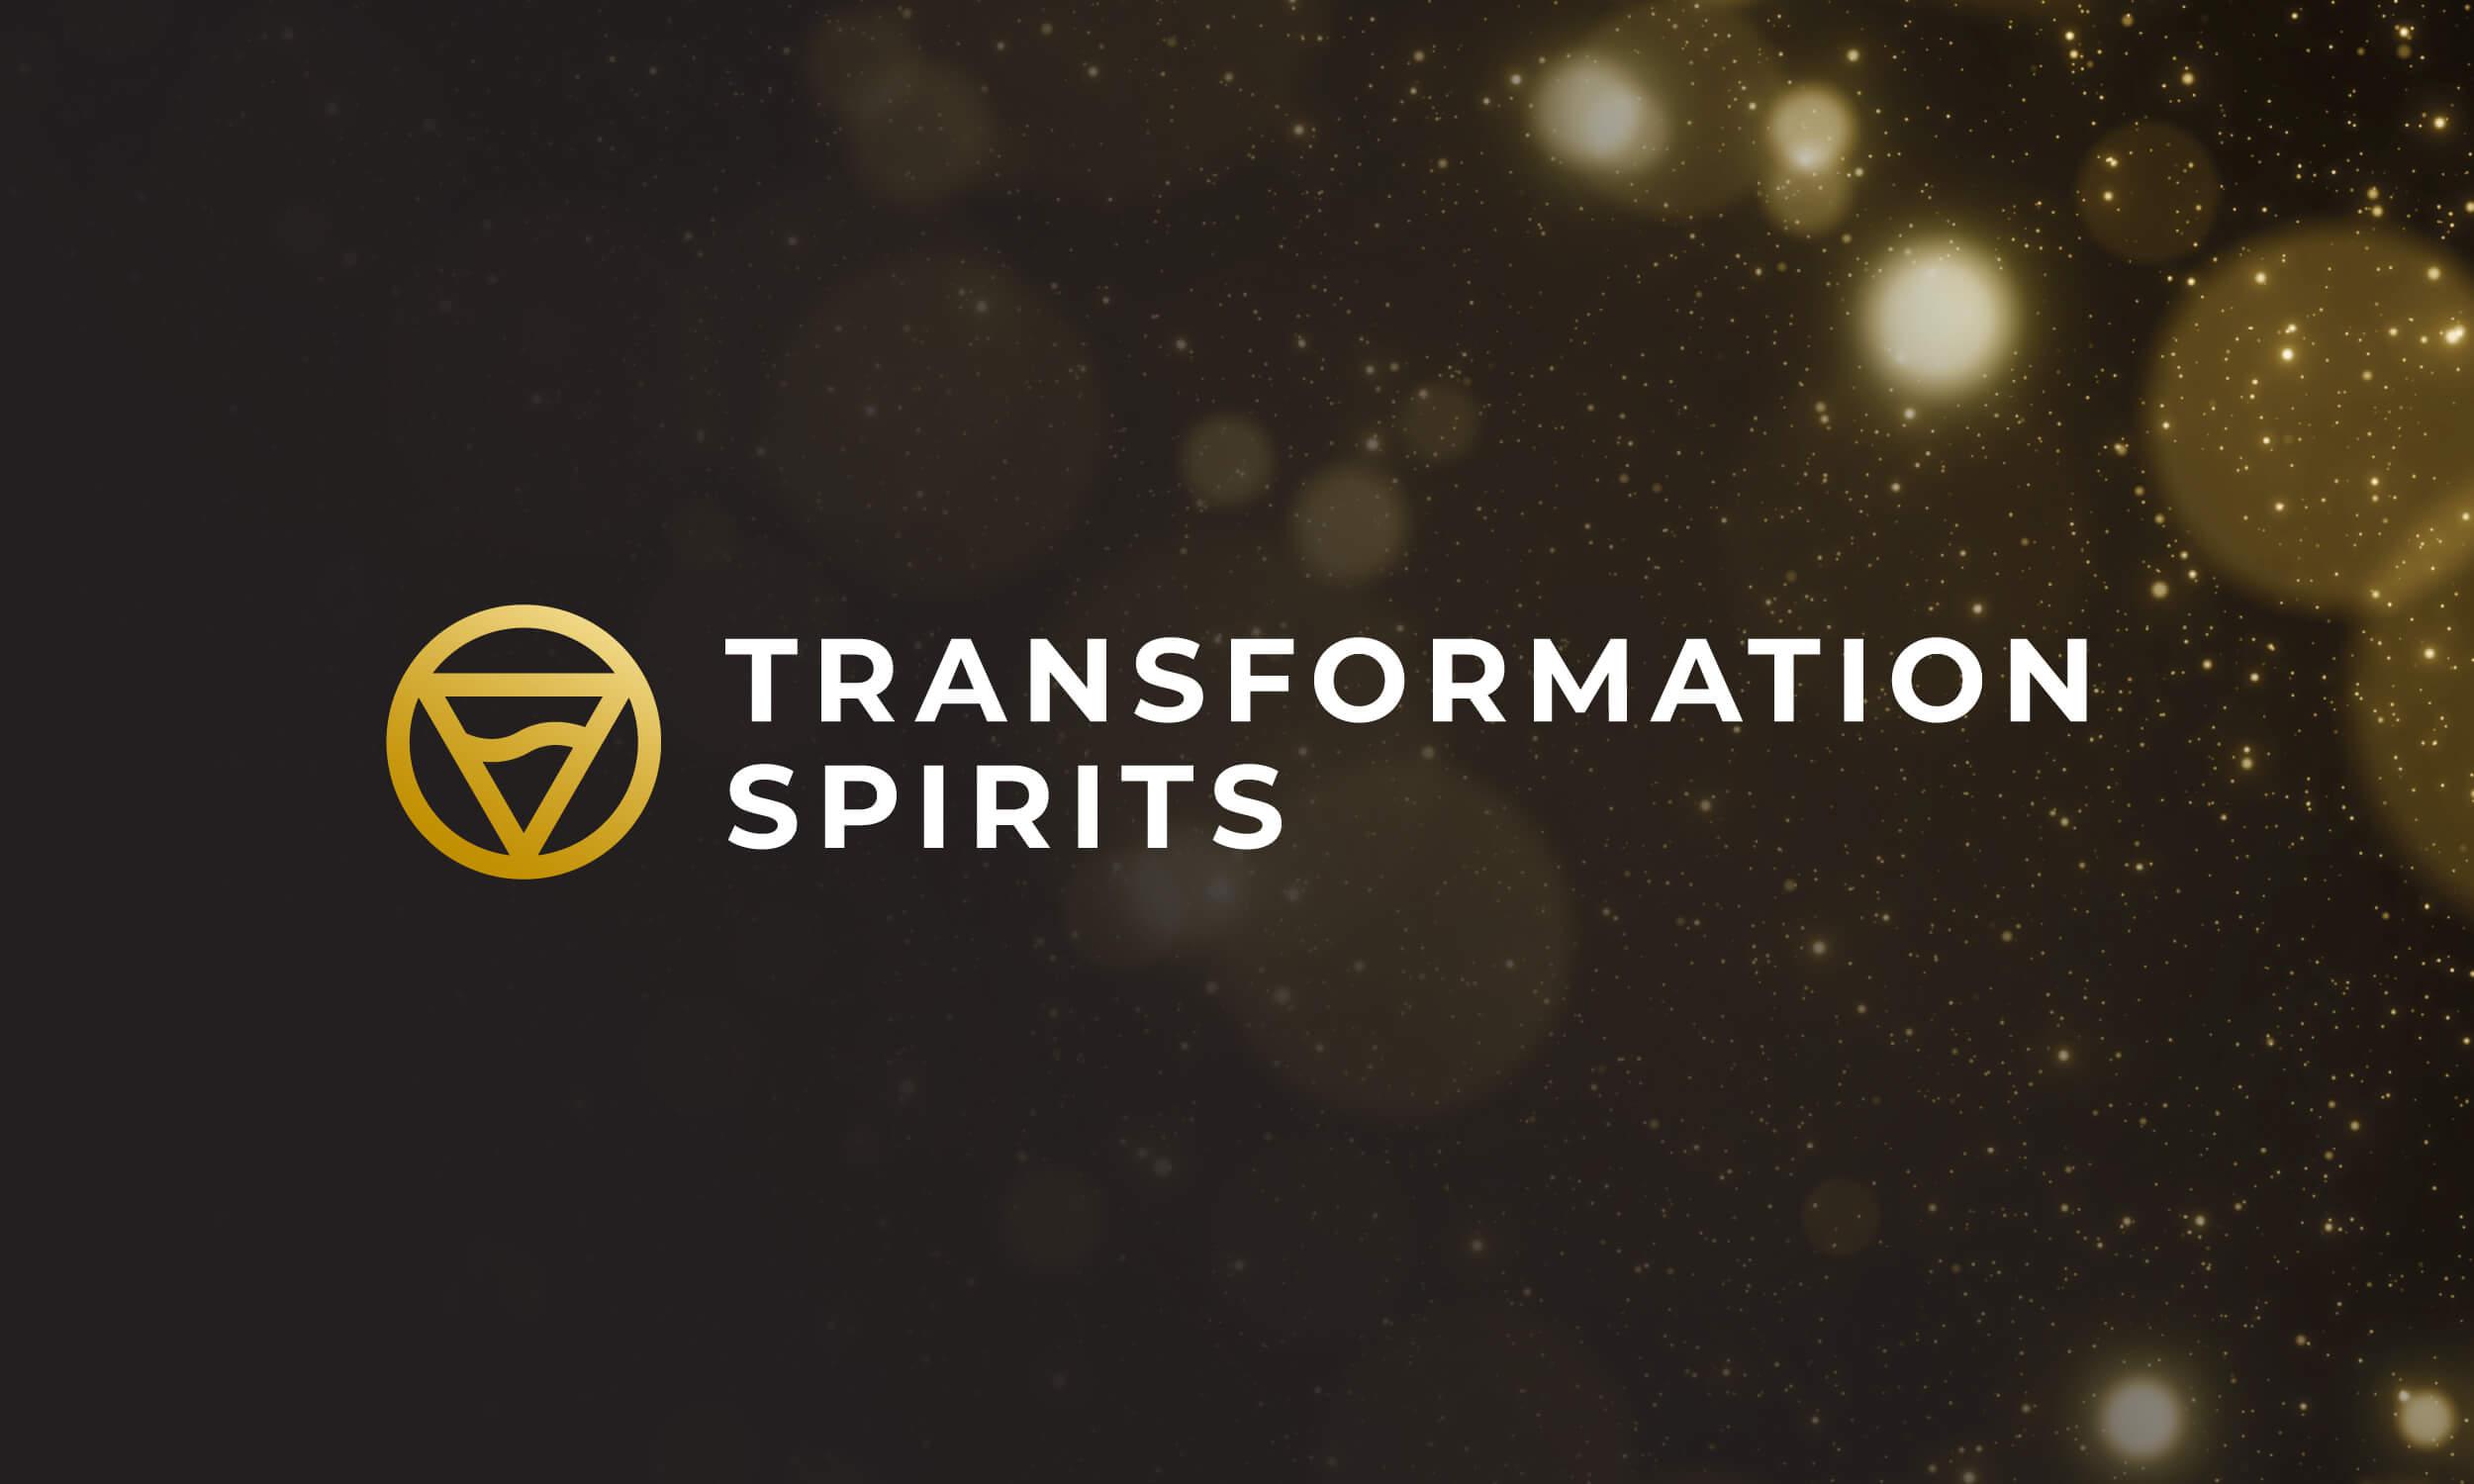 Transformation Spirits